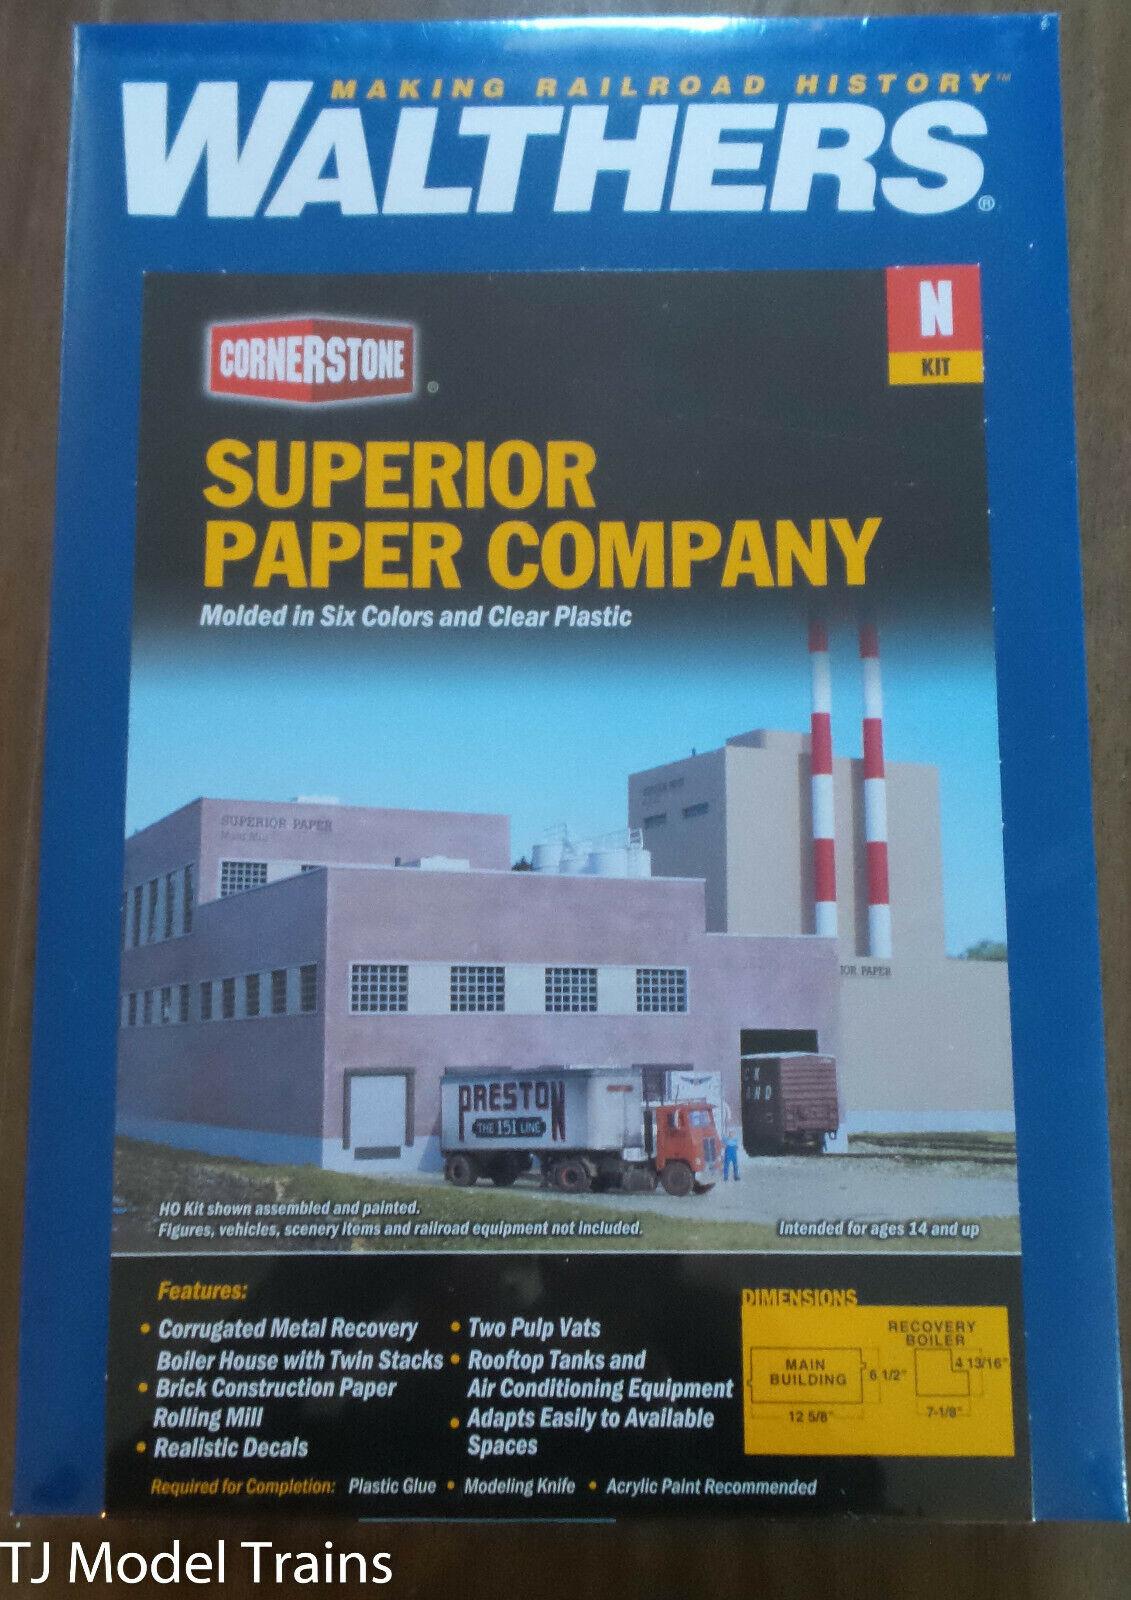 Walthers Cornerstone  3237 súperior Paper Company